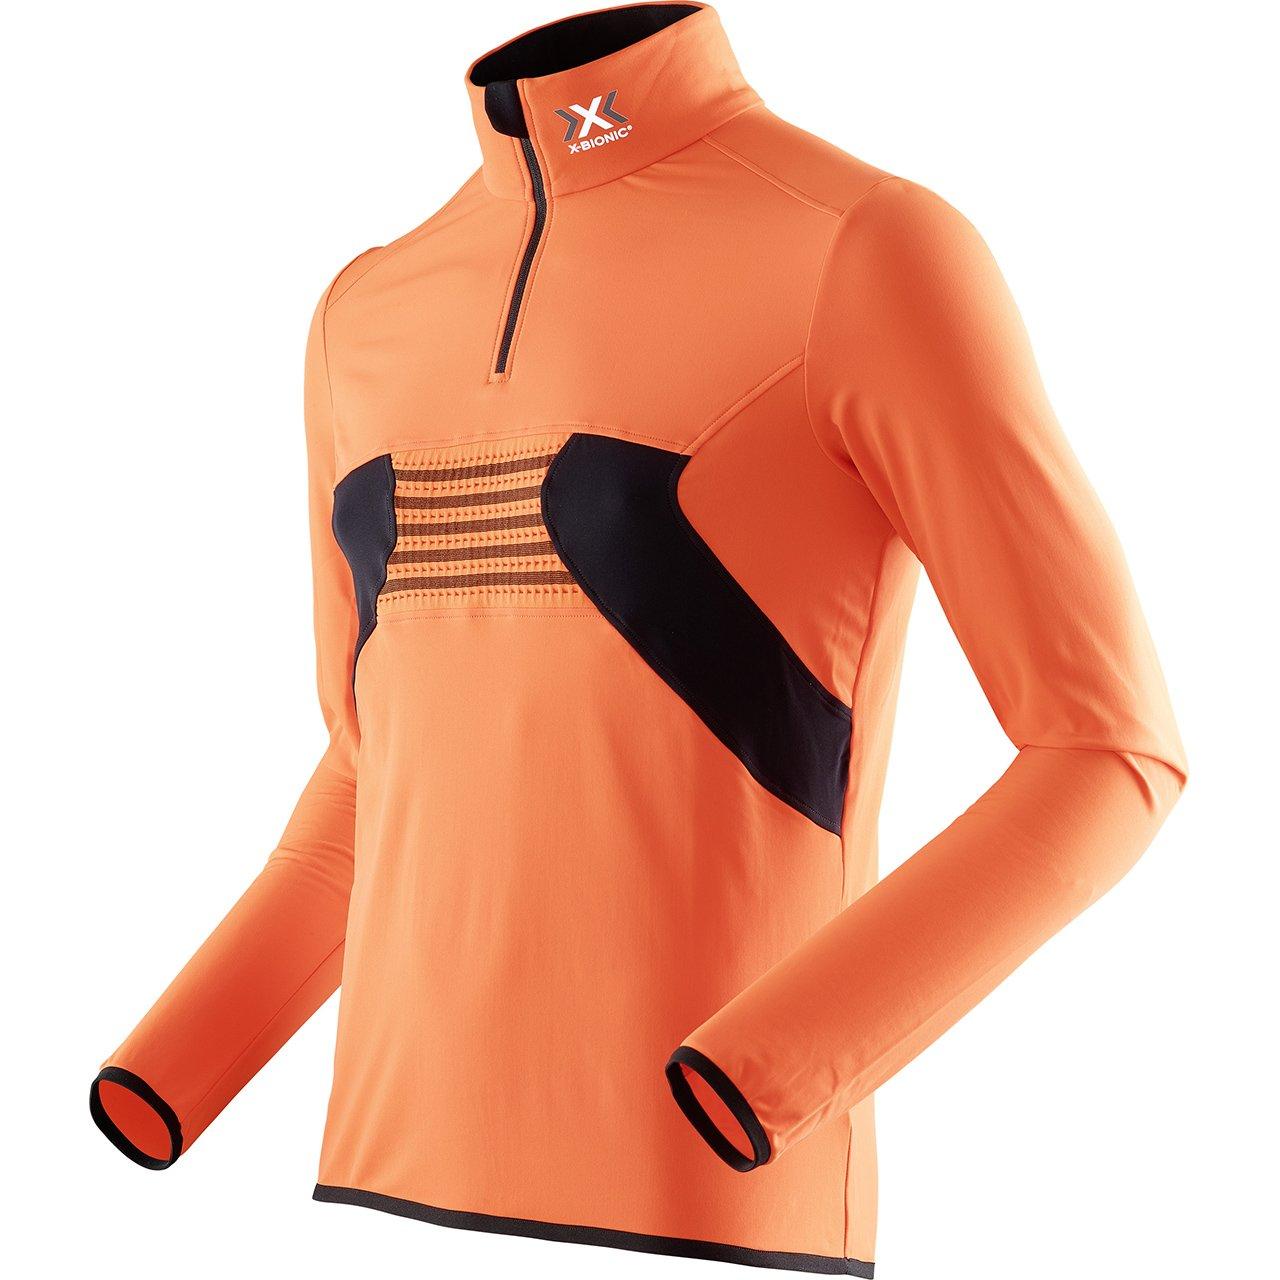 X-Bionic Mapache Camiseta/Jacket Naranja XL: Amazon.es: Deportes y ...